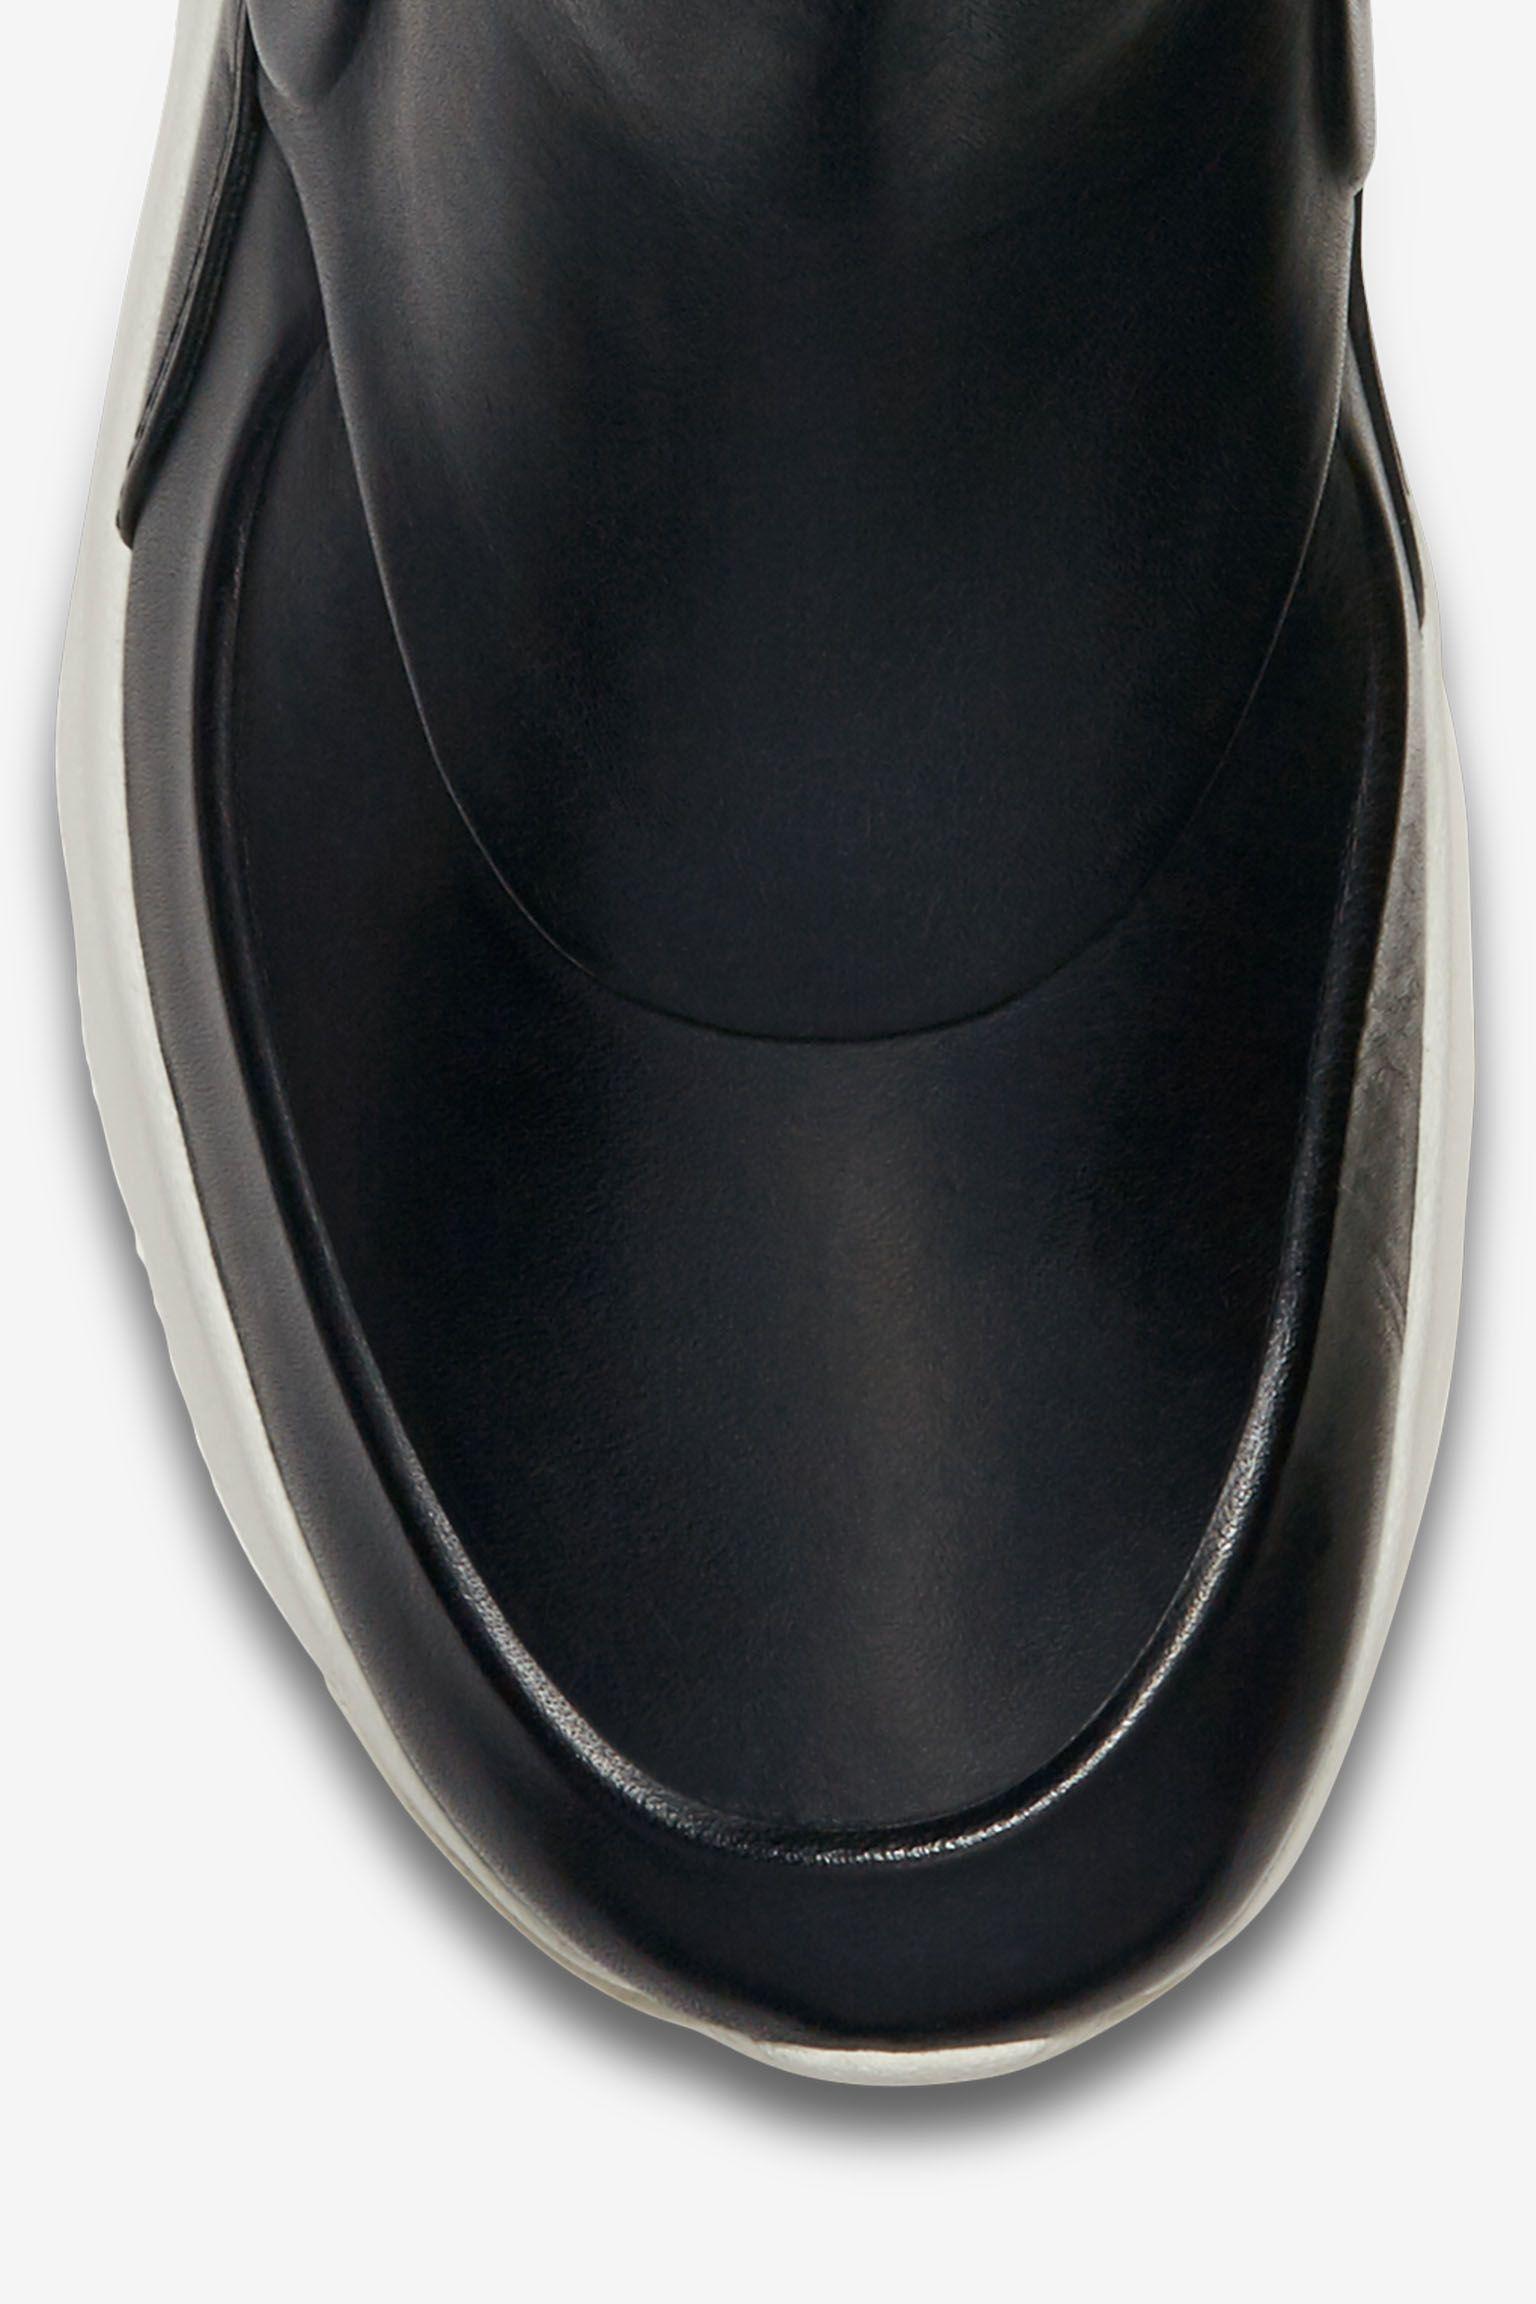 Nike Air Max Thea Mid 'Black & White' til kvinder